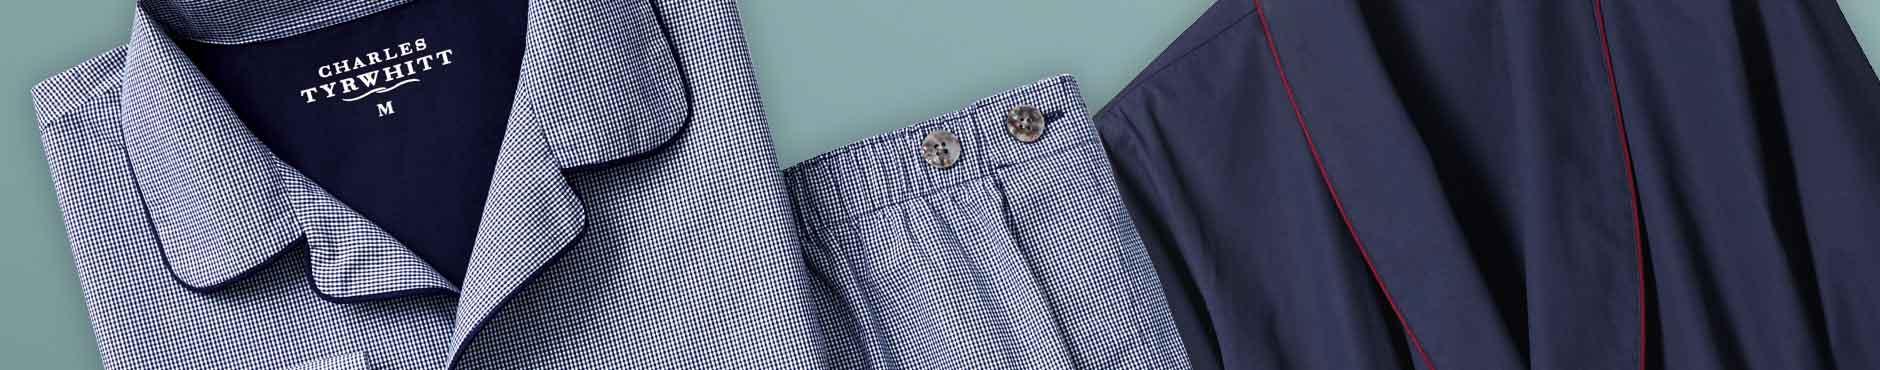 Charles Tyrwhitt  T-Shirts & Pyjamas